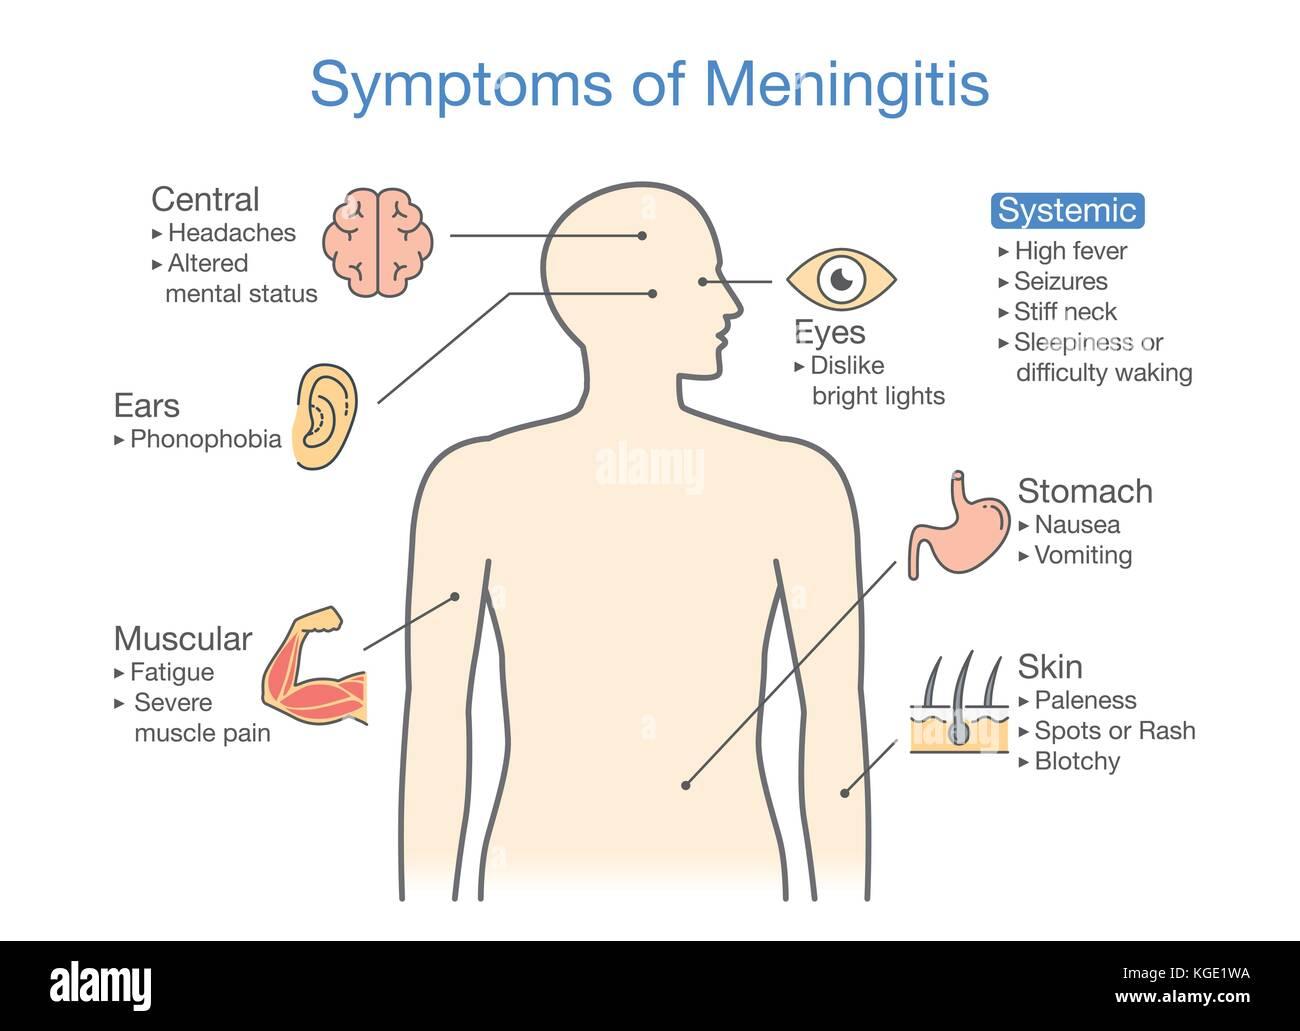 Diagram to showing patient symptoms with Meningitis disease. - Stock Image